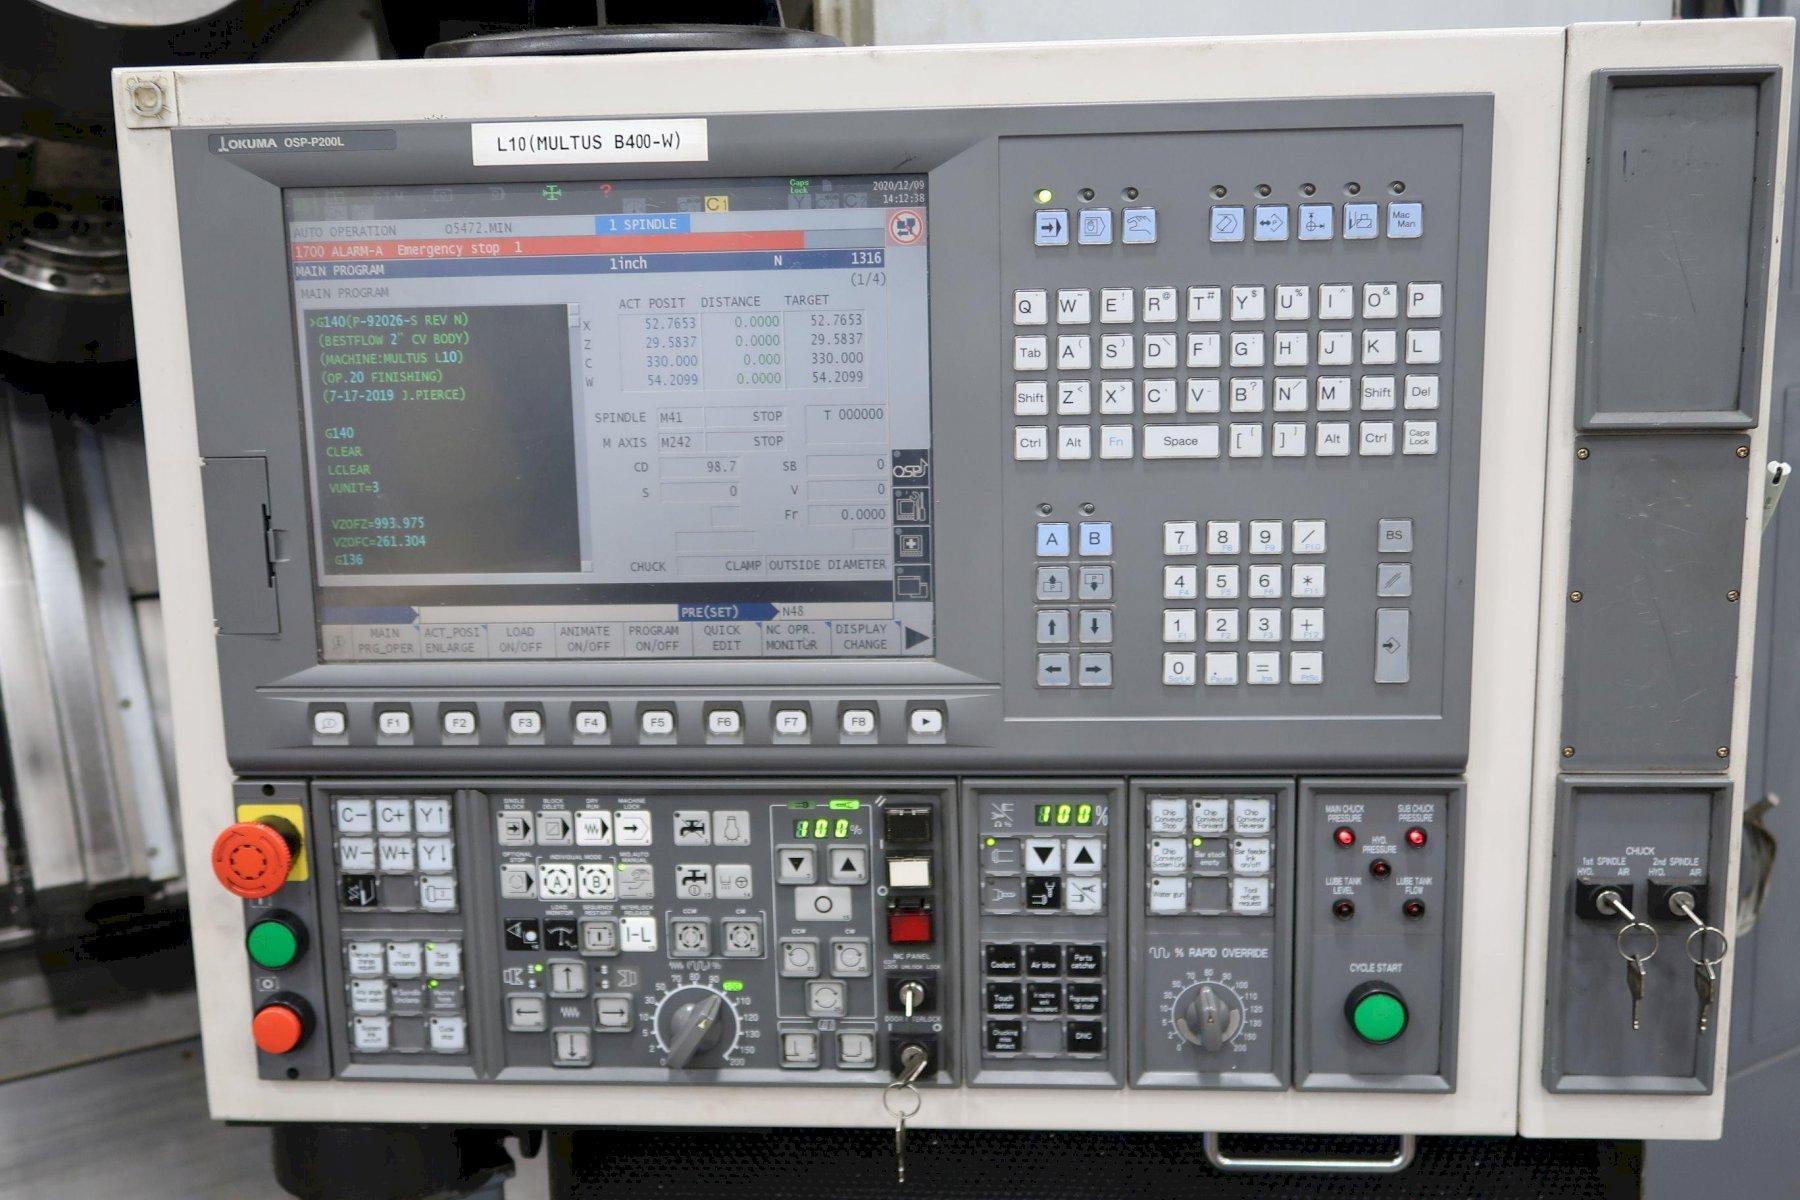 2008 Okuma Multus B400W - CNC Horizontal Lathe